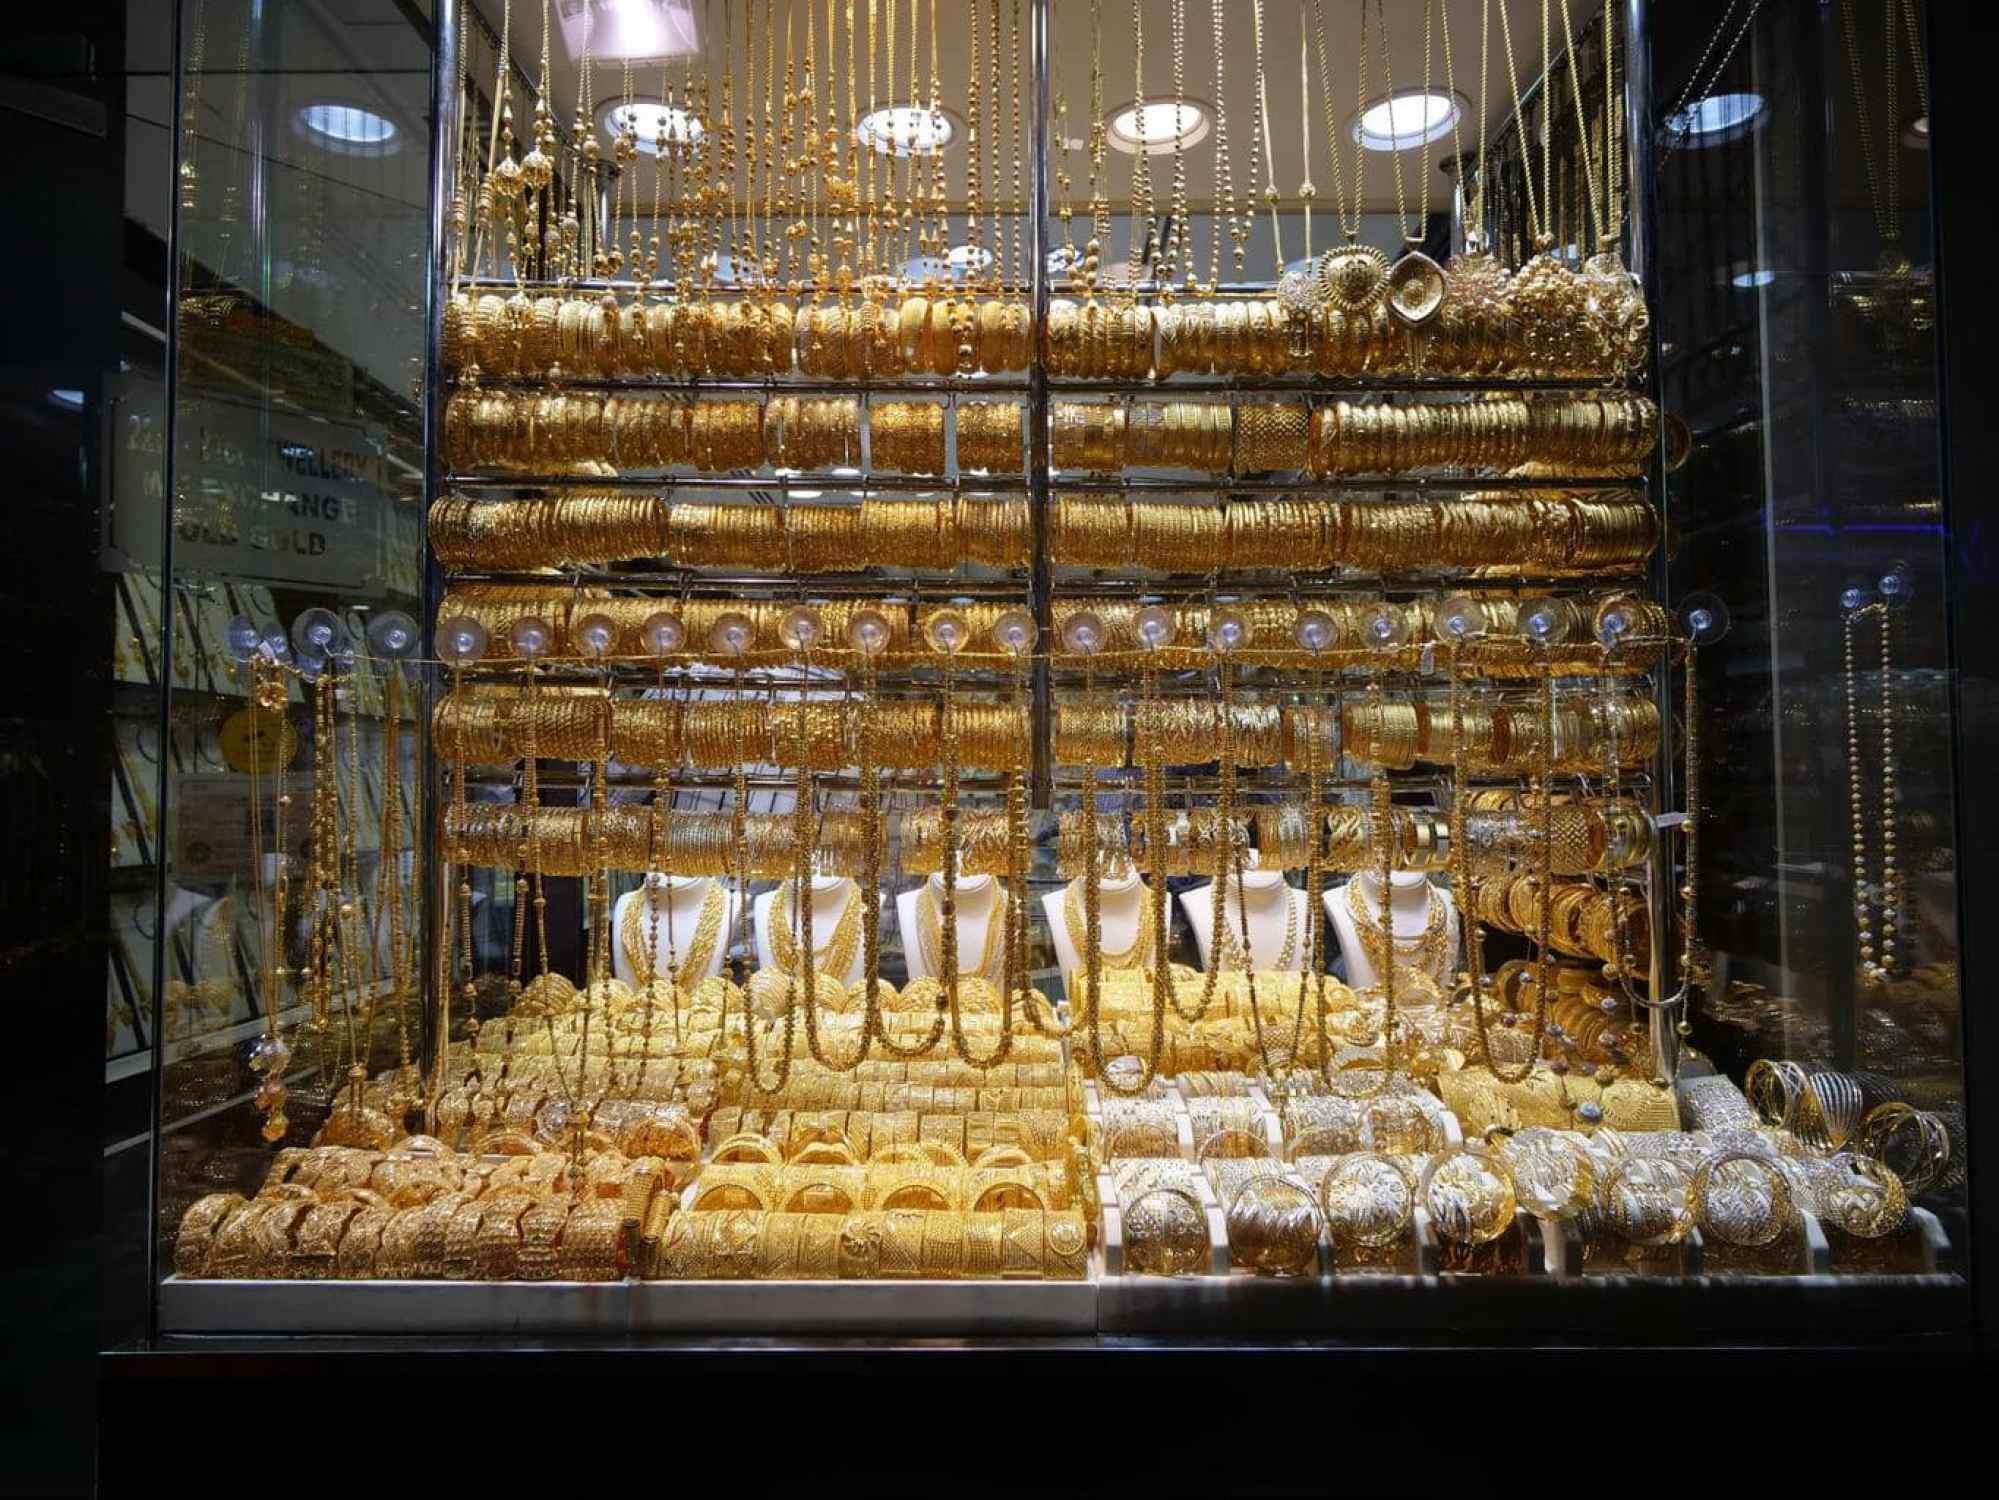 The Gold Souk jewellery